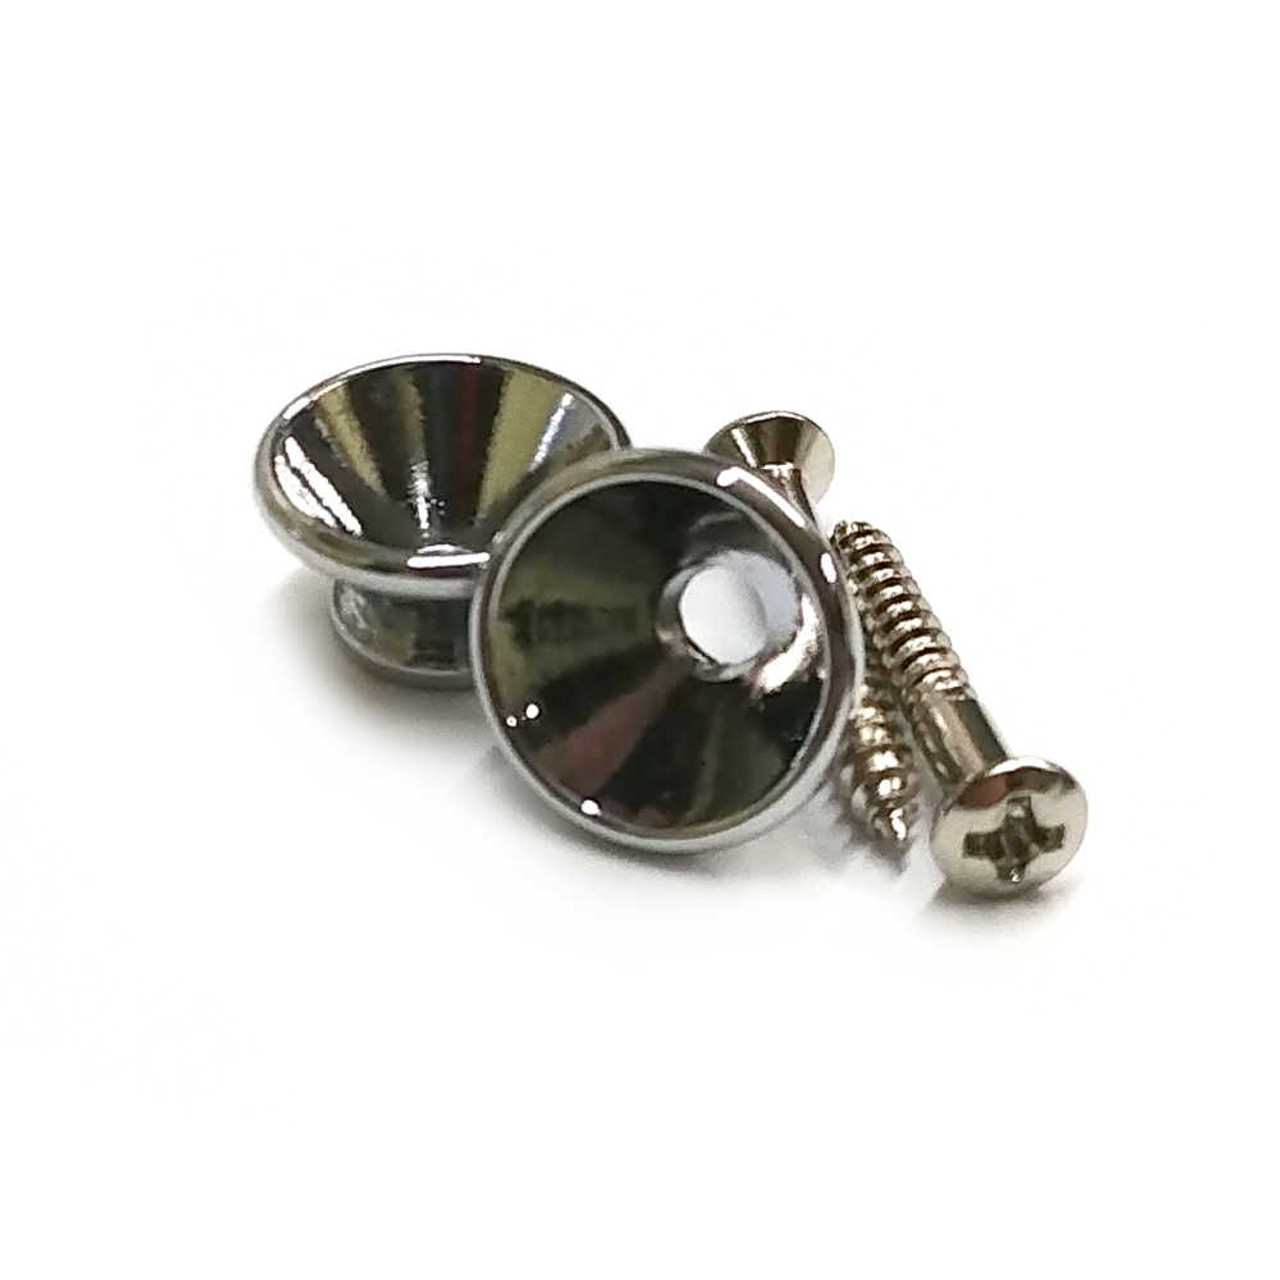 Large Strap Buttons - Chrome (pair)